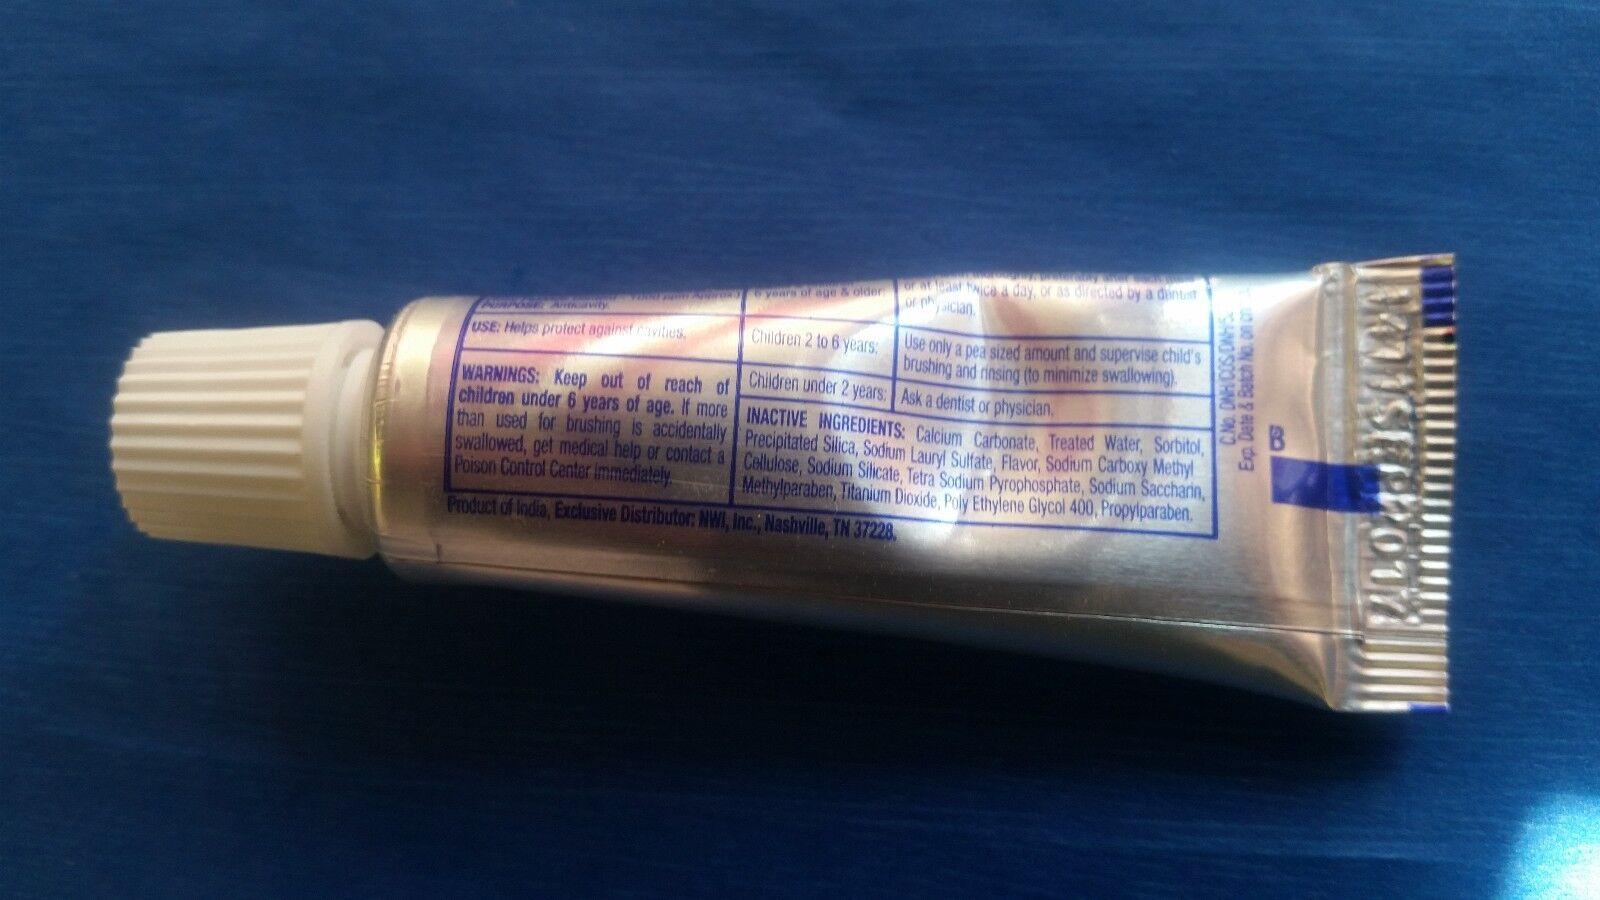 288 TUBES TOOTHPASTE WHOLESALE FRESHMINT 0.6 oz oz oz CHARITIESTRAVELPETS 5bb5a8